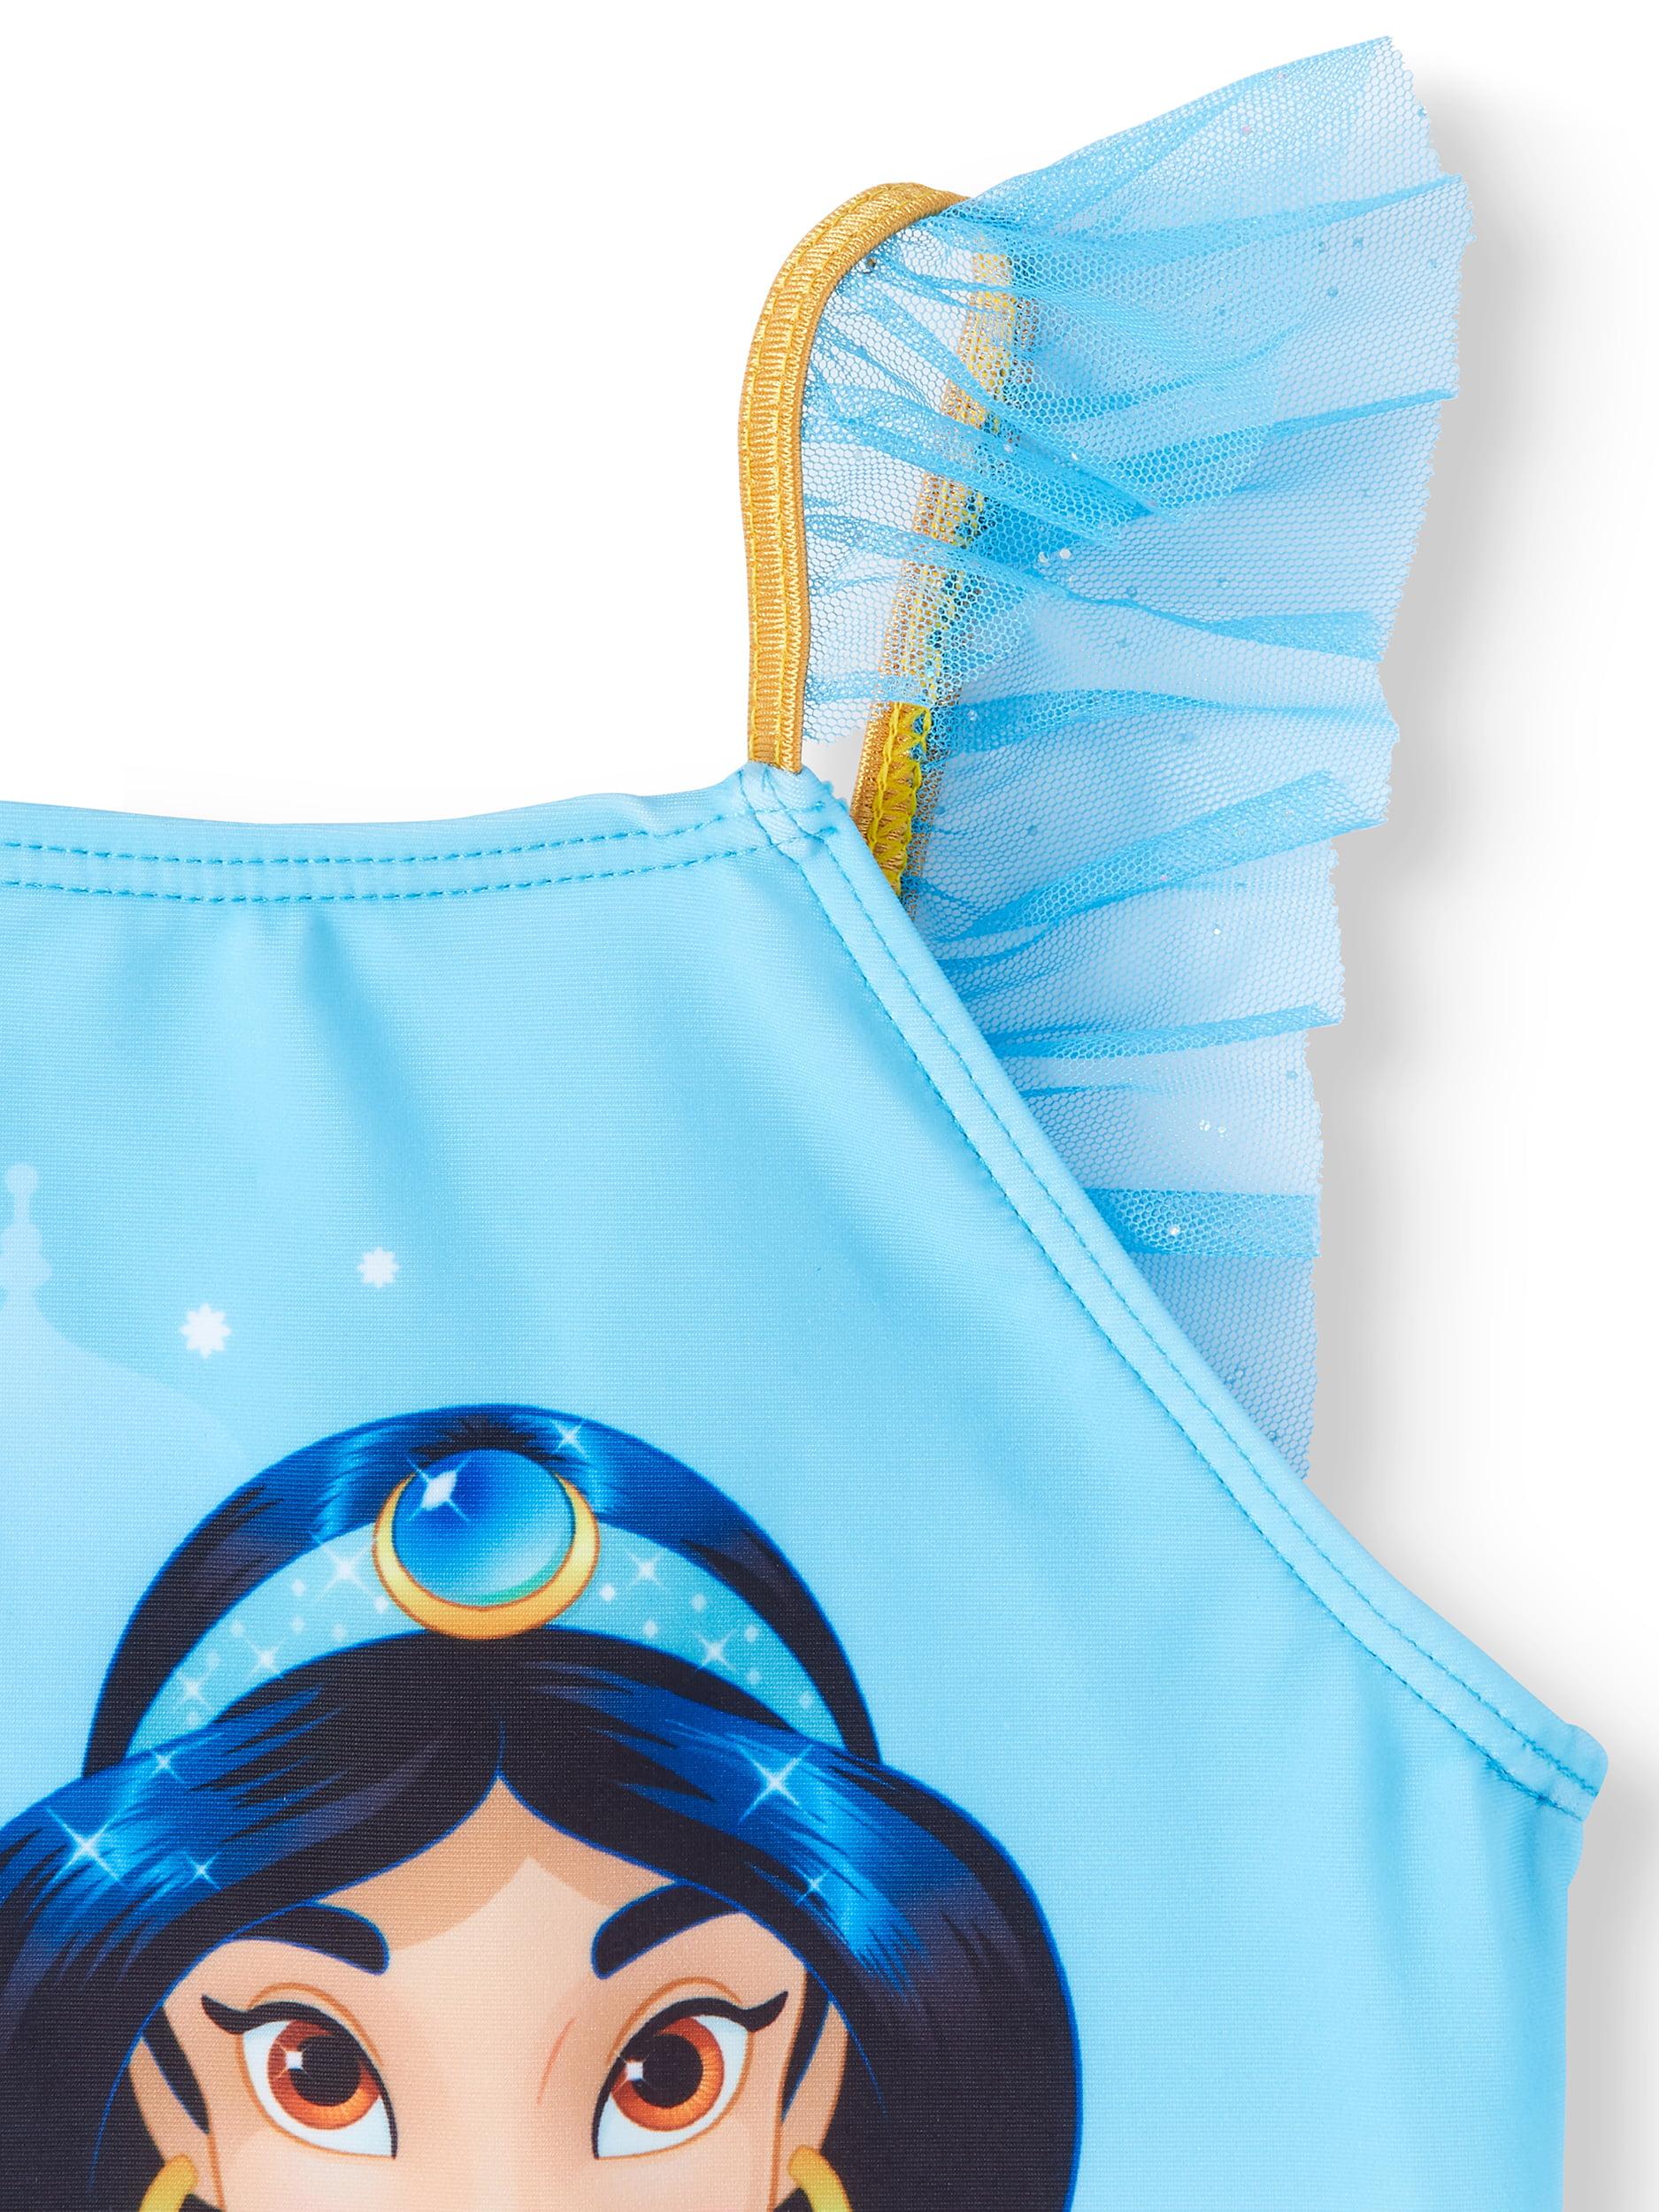 4c5c05c633 Disney Princess - Princess Jasmine Ruffled Tankini Swimsuit (Little Girls)  - Walmart.com